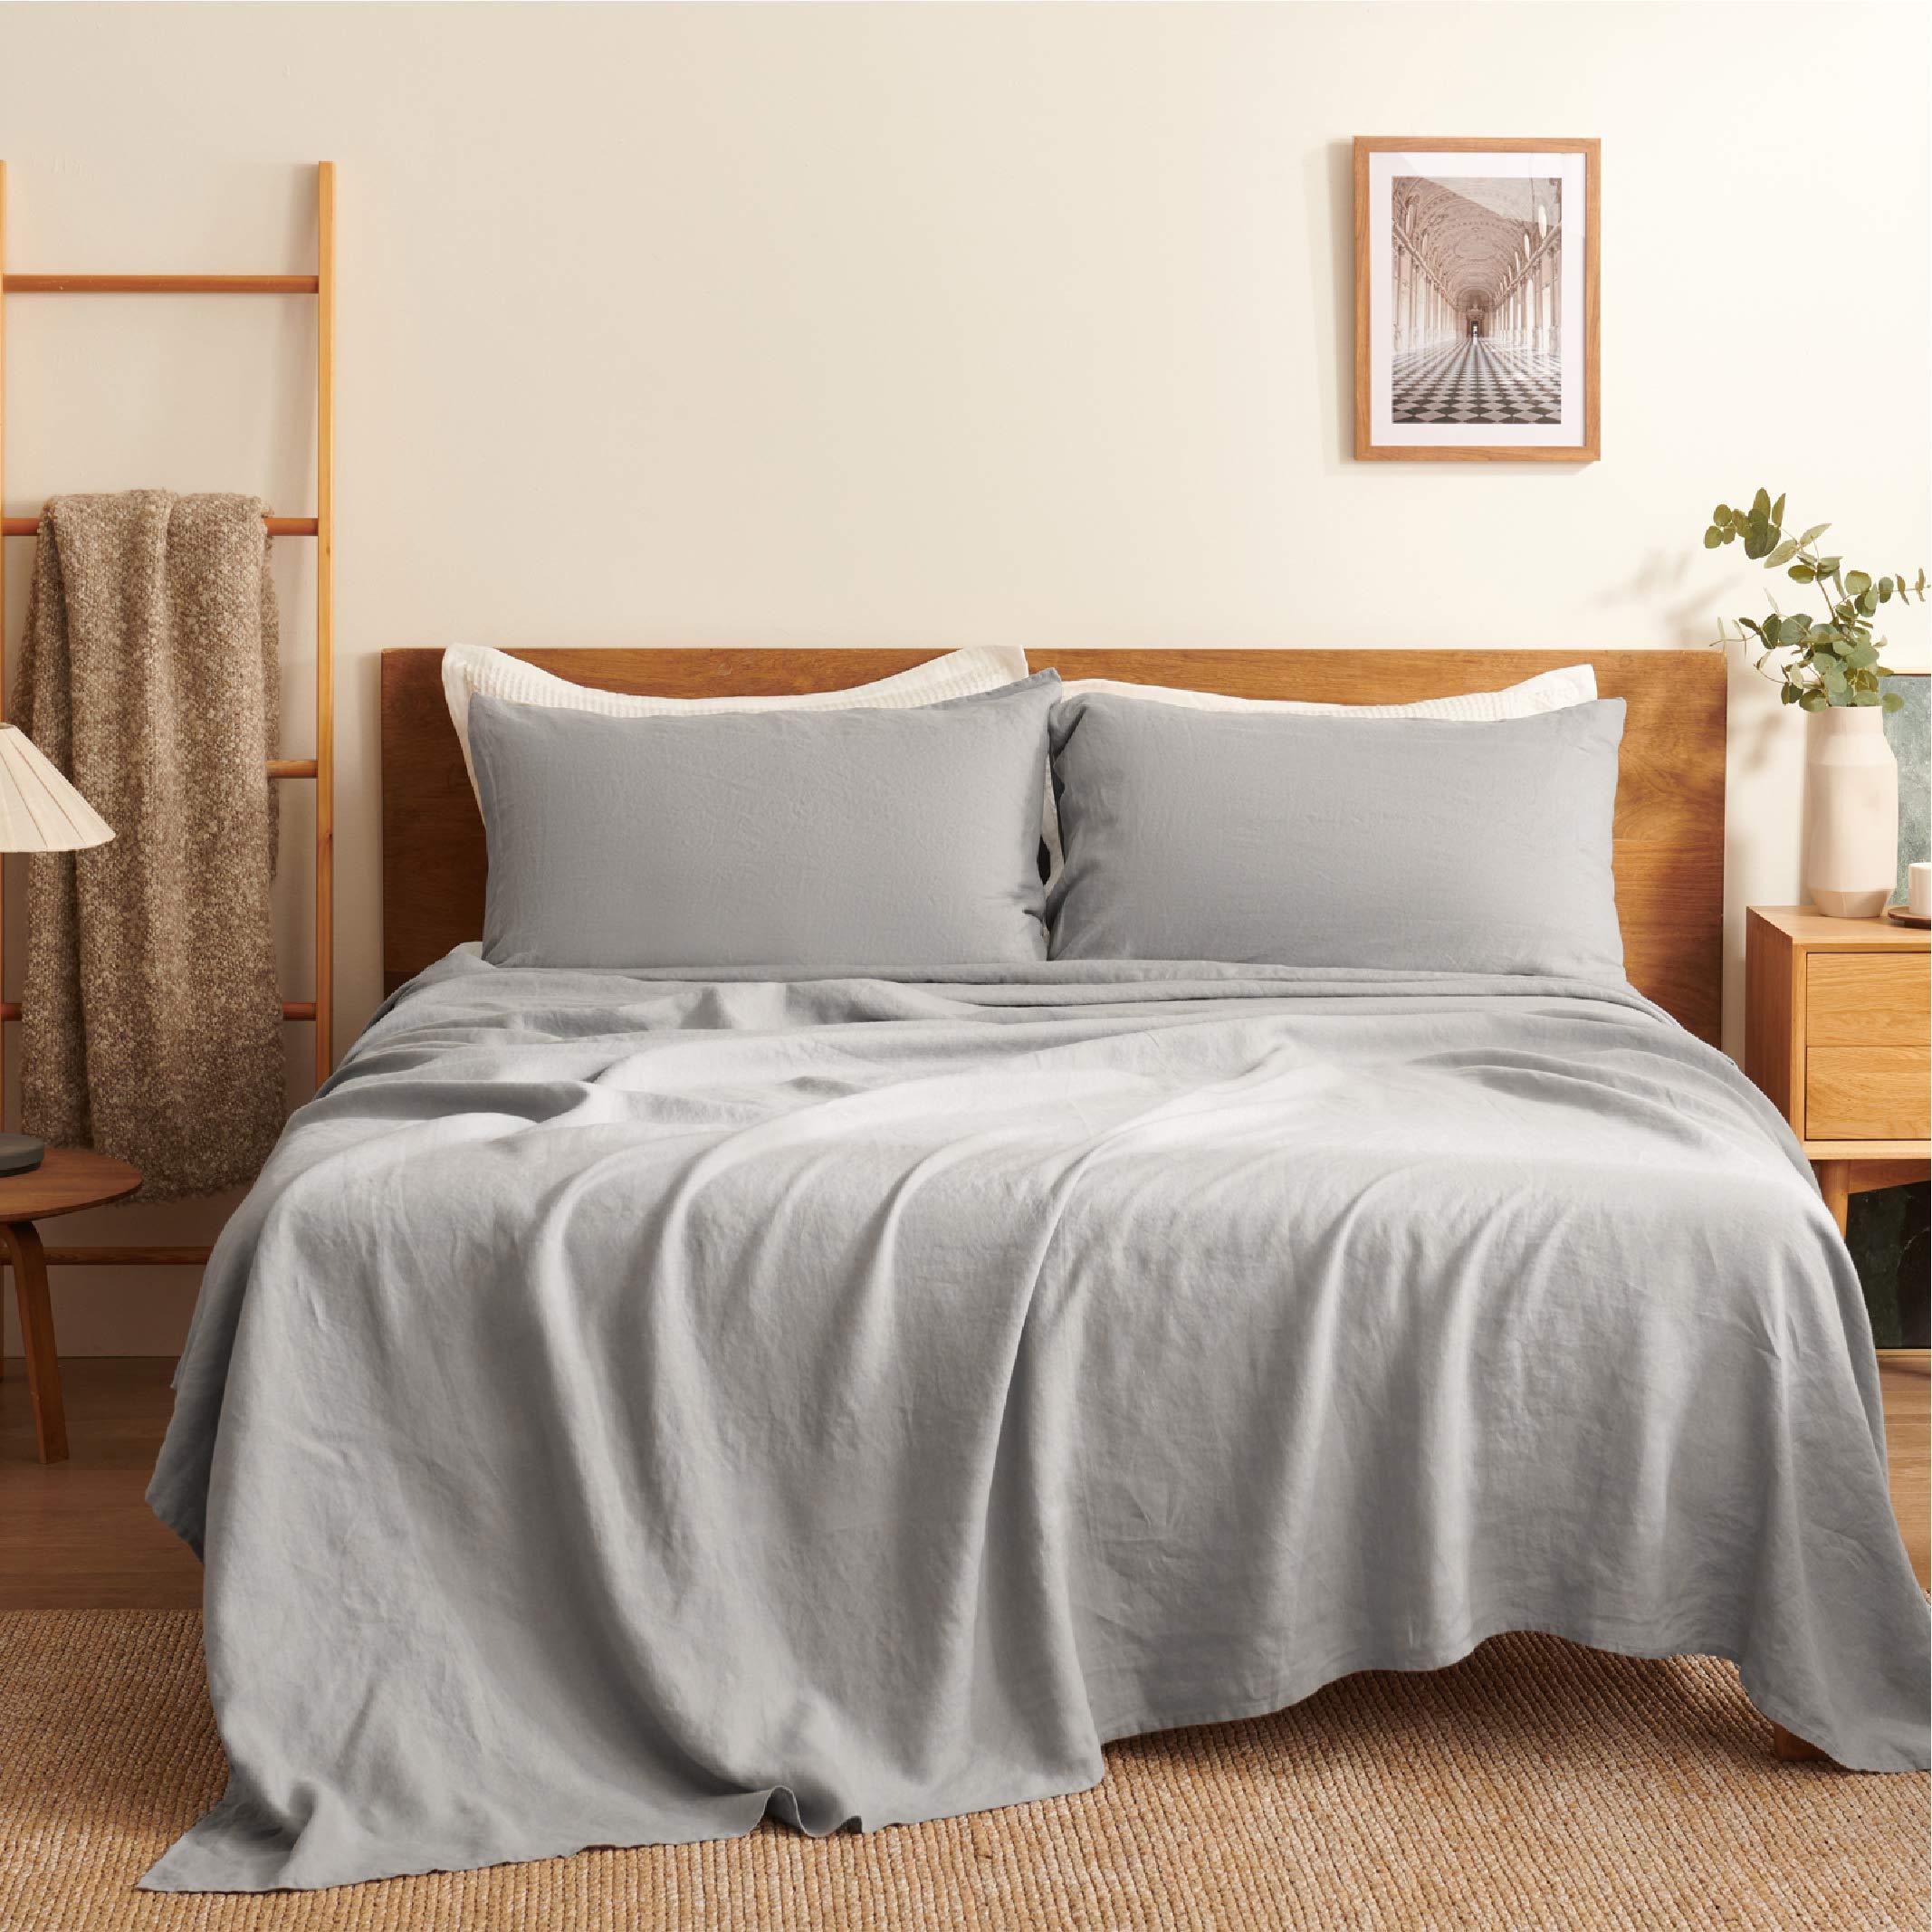 "Bedsure Linen Sheets Set California King Size - 100% Linen Bed Sheets Deep Pocket Sheets, Breathable Bedding Set, Washed French Linen Sheet ( Grey, 108""x102"" )"